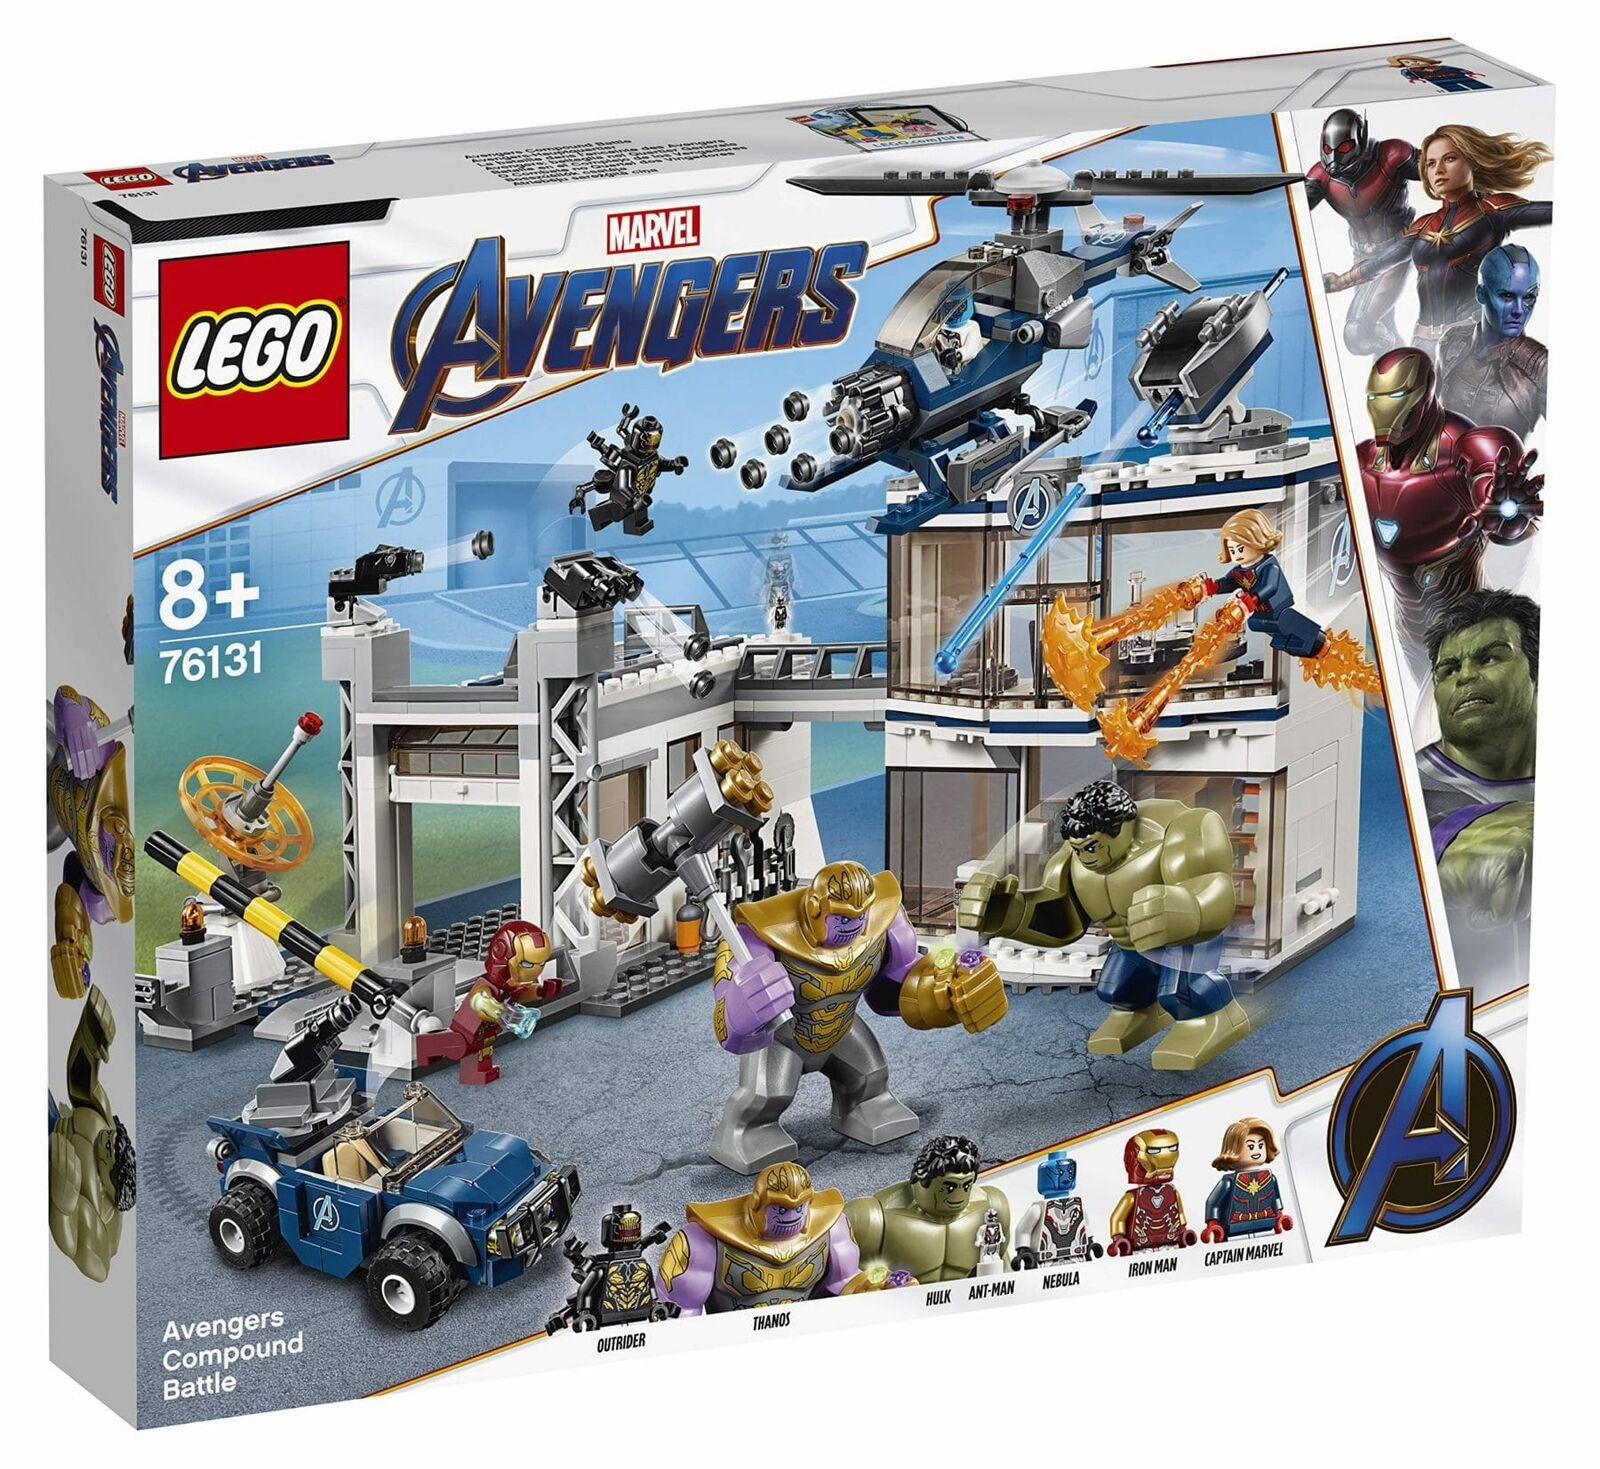 Lego ® 76131 Marvel Super Heroes Avengers compoud Battle